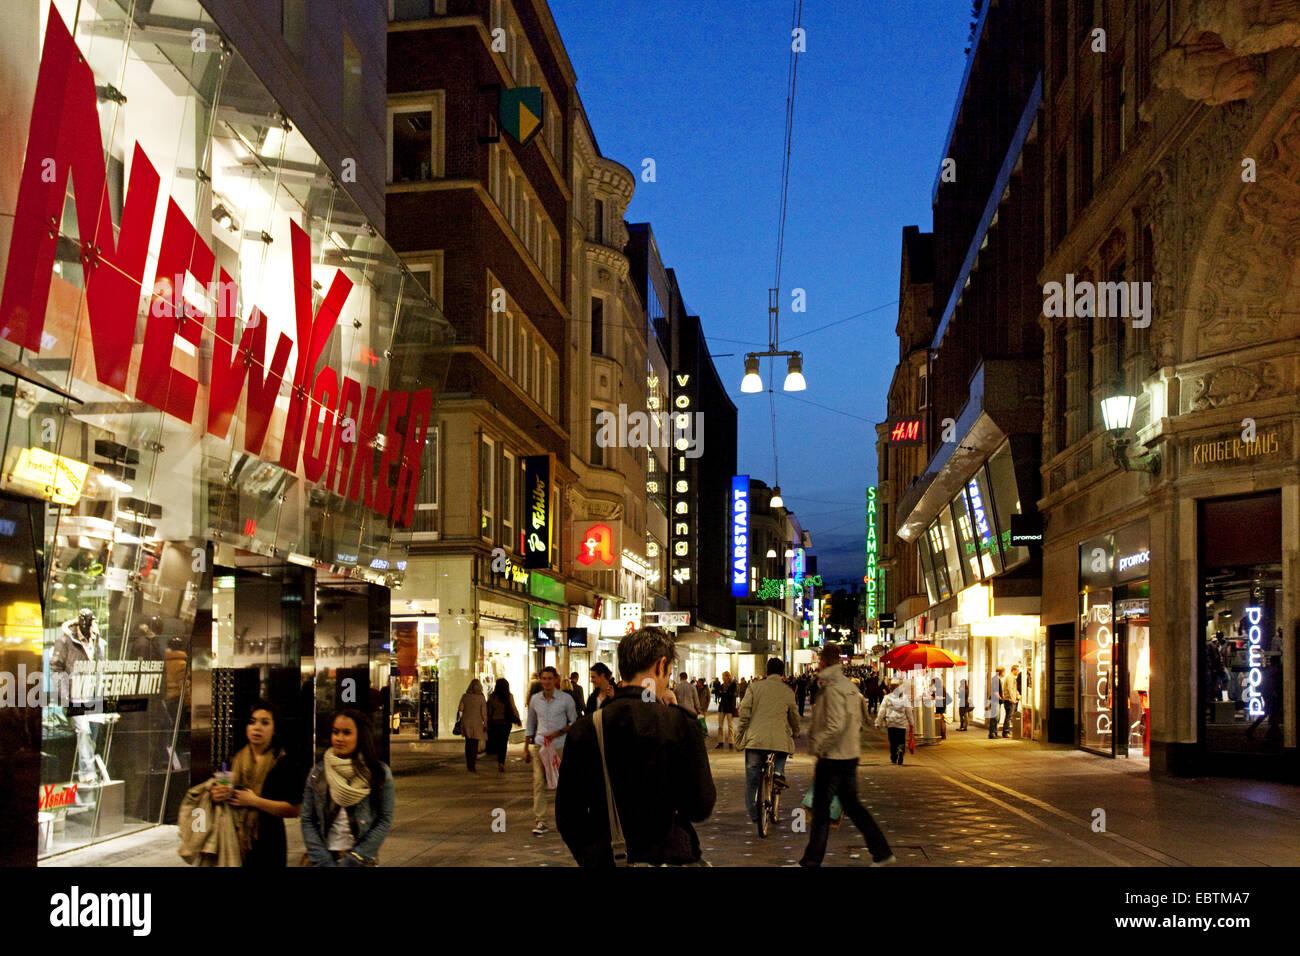 outlet super cute exquisite style Dortmund City Stock Photos & Dortmund City Stock Images - Alamy